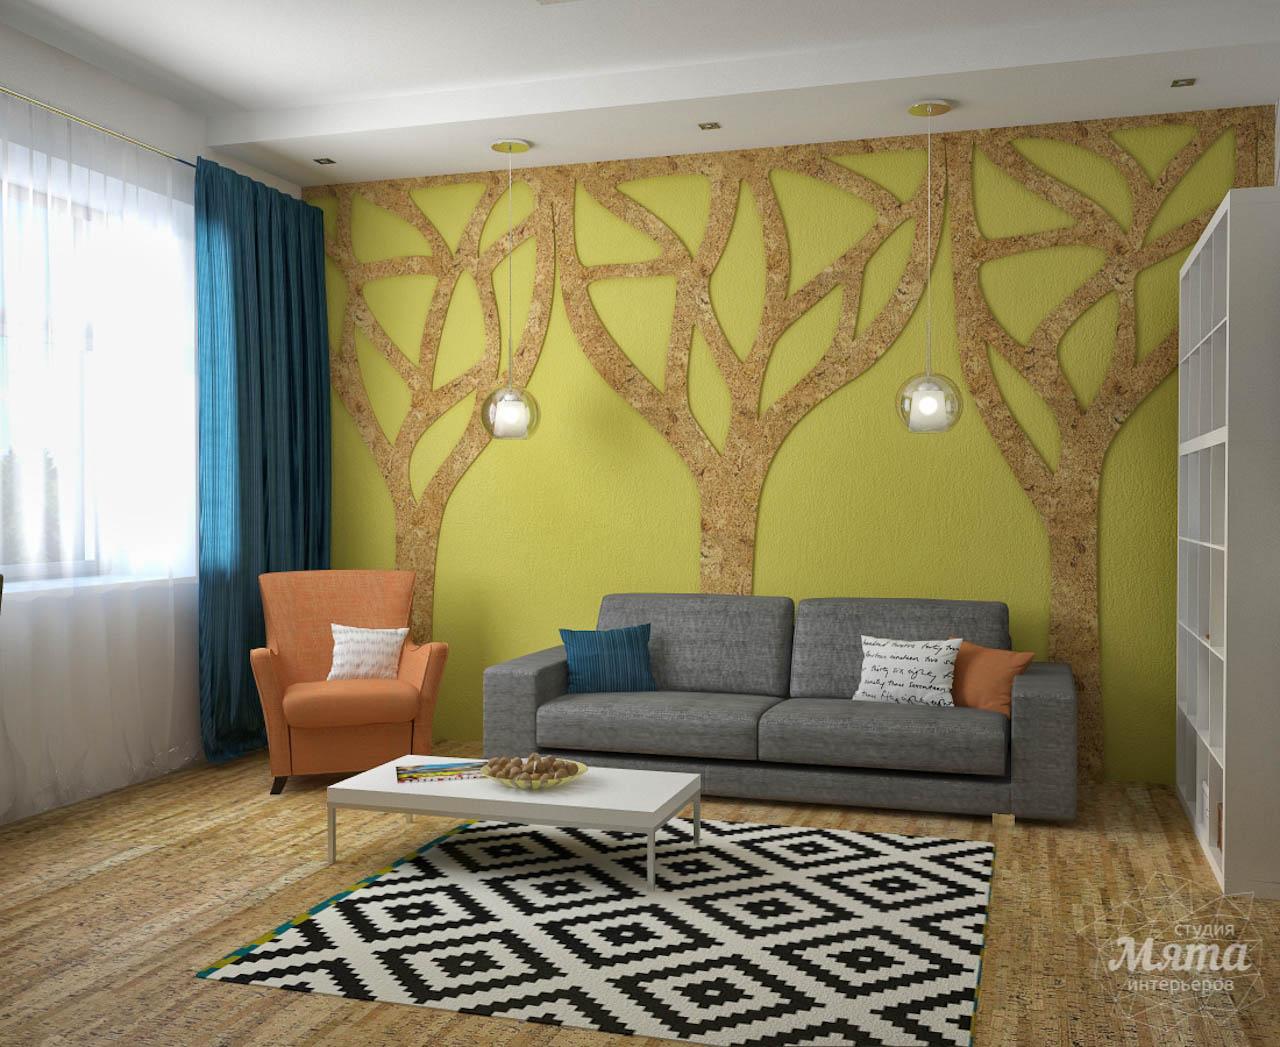 Дизайн проект интерьера коттеджа  в стиле минимализм по ул. Барвинка 15 img1678550920